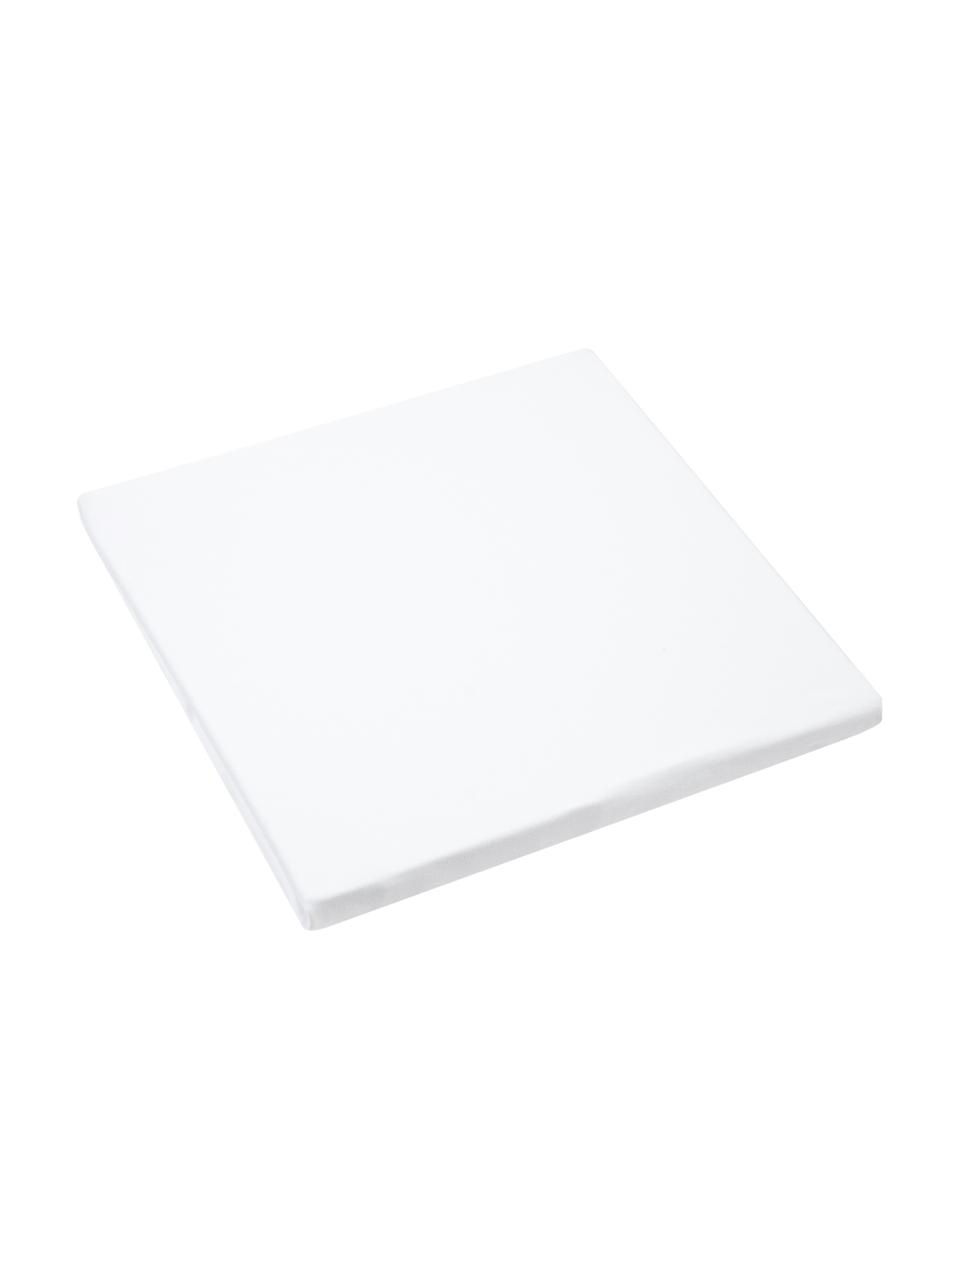 Lenzuolo con angoli in jersey-elastan bianco Lara, 95% cotone, 5% elastan, Bianco, Larg. 140 x Lung. 200 cm